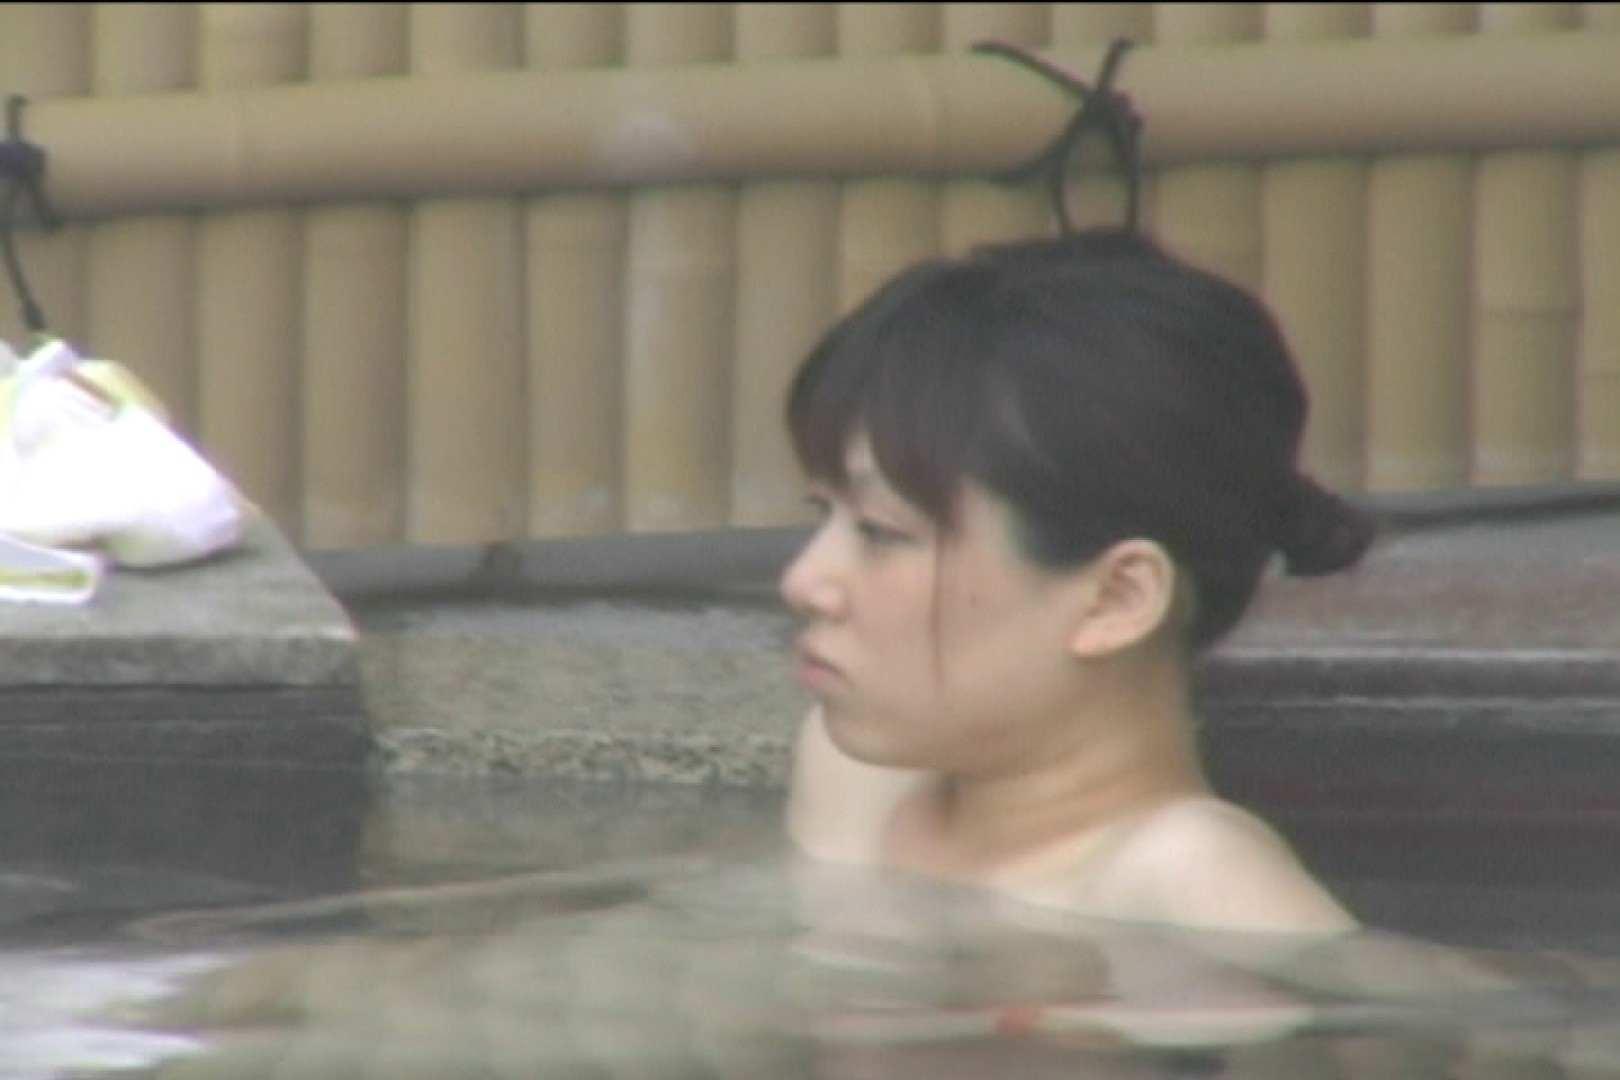 Aquaな露天風呂Vol.121 露天風呂編   盗撮シリーズ  82PIX 37